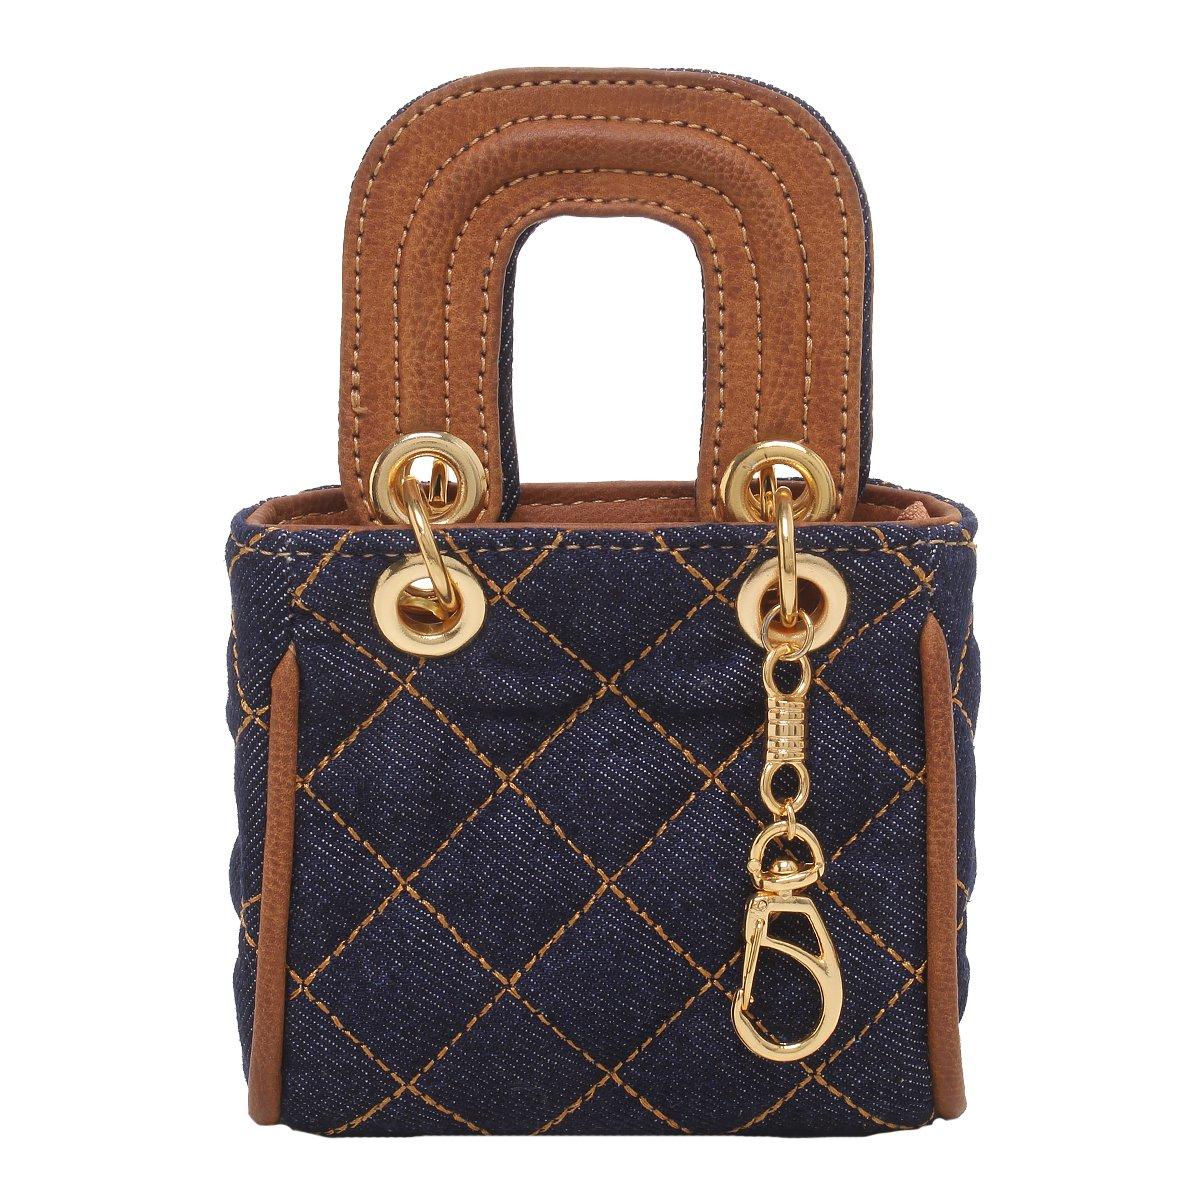 Bolsa Birô Mini Bag Sabrina Sato - Compre Agora   Netshoes 4f69c0a812